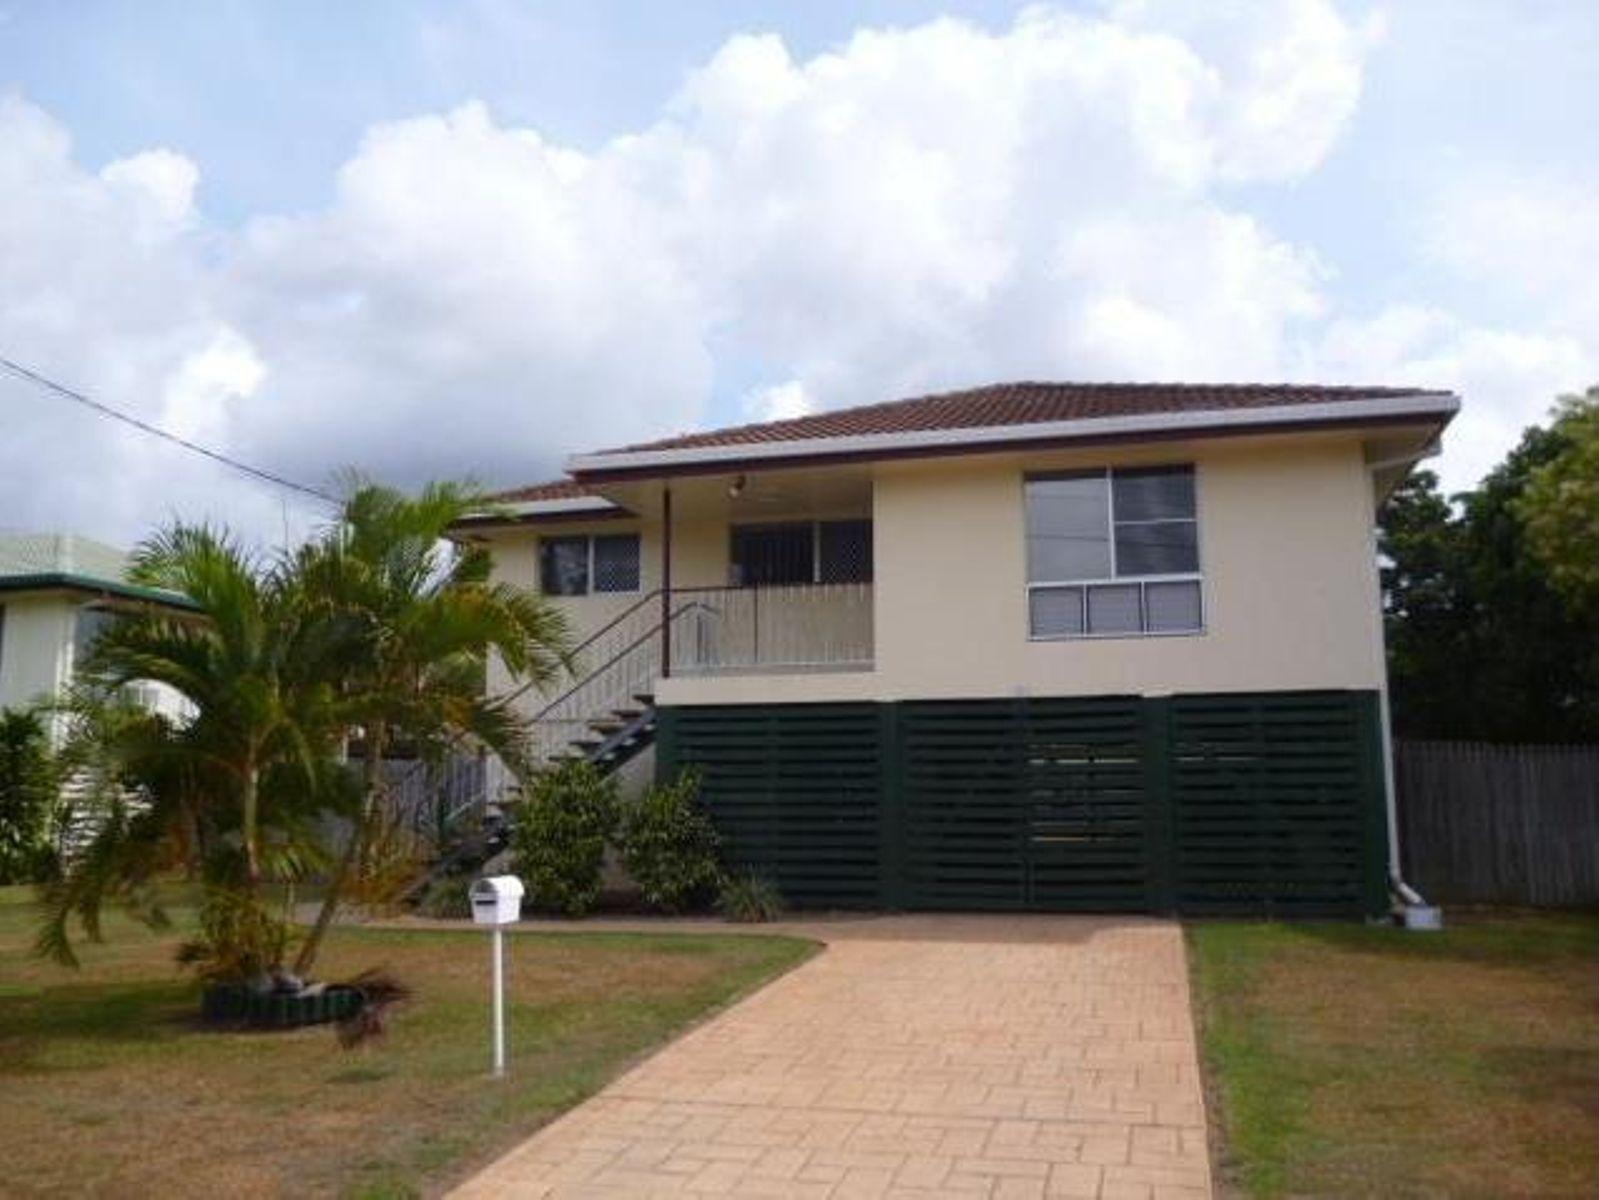 7 Hall Street, Aitkenvale, QLD 4814